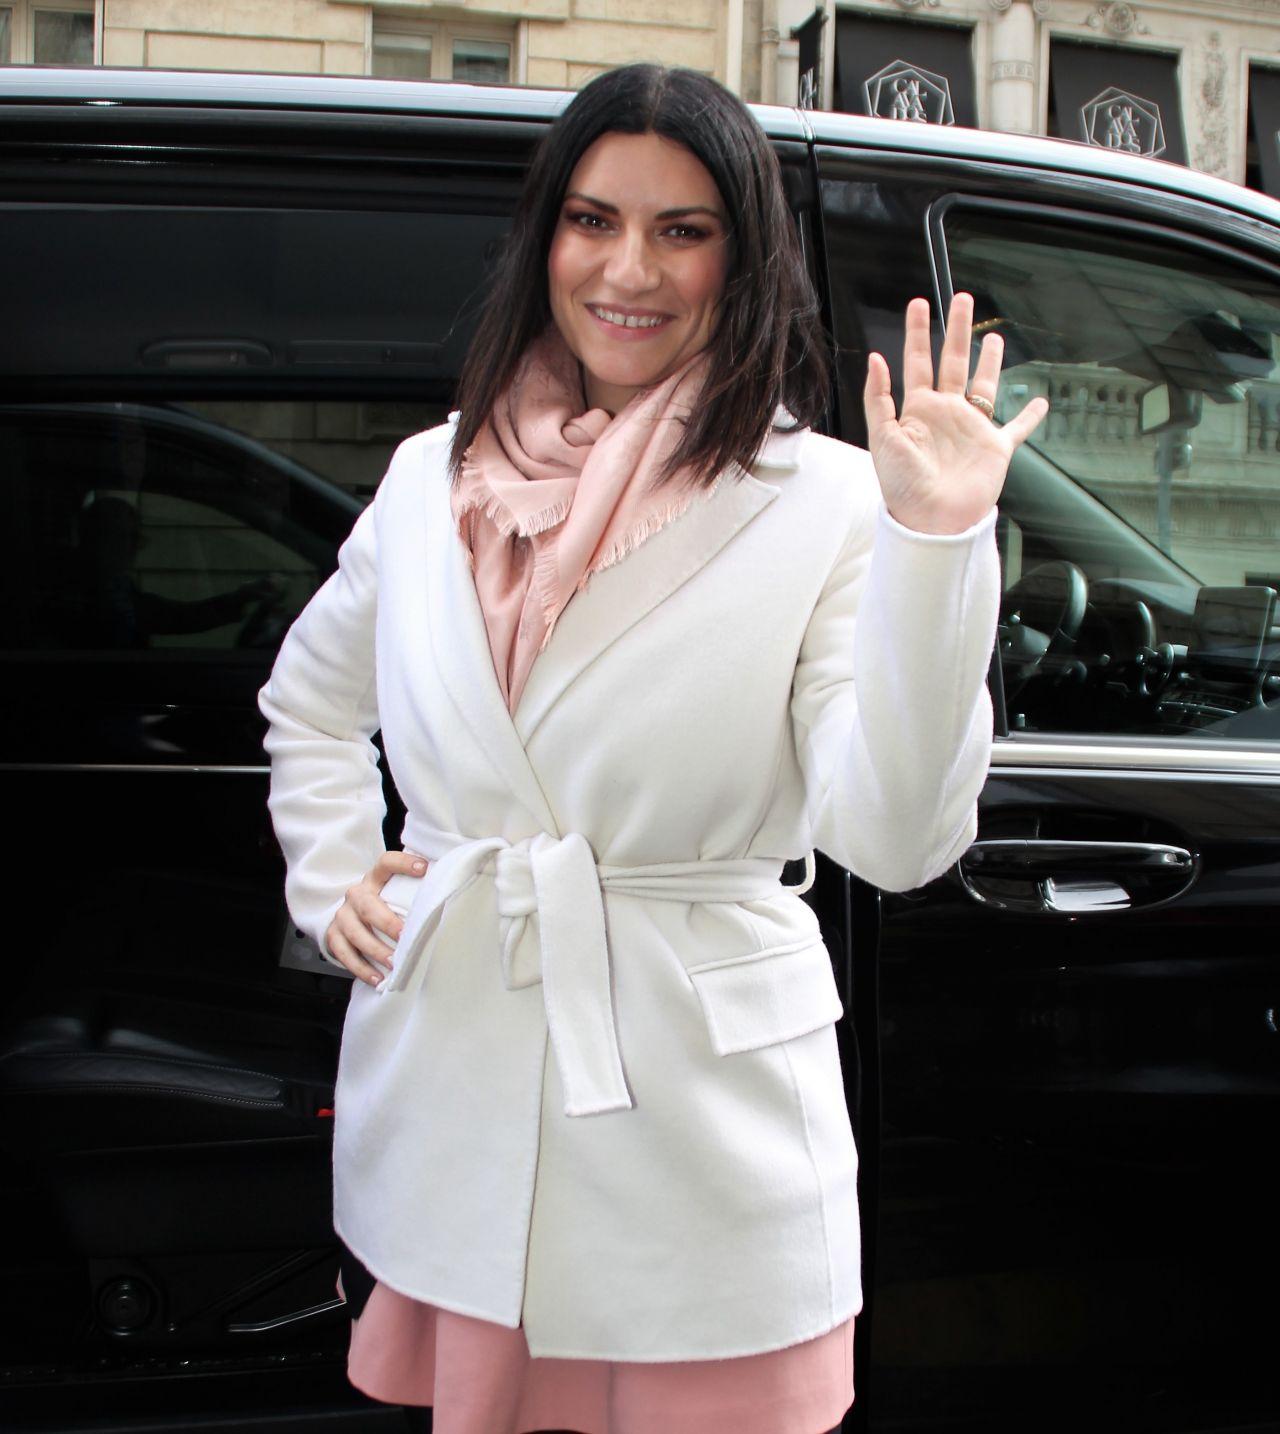 http://celebmafia.com/wp-content/uploads/2018/03/laura-pausini-leaves-a-hotel-in-paris-03-29-2018-4.jpg